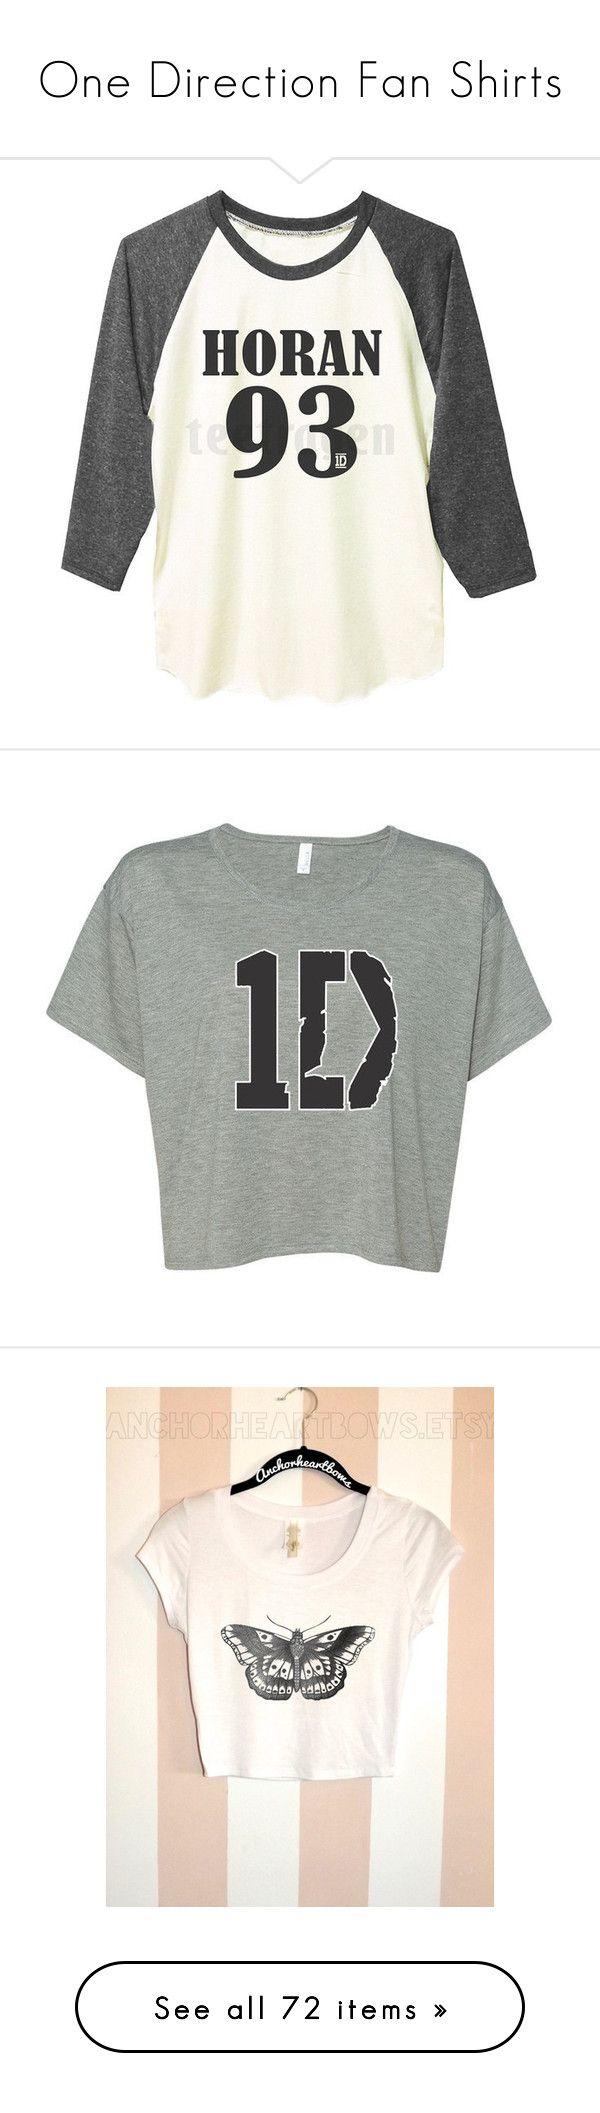 """One Direction Fan Shirts"" by lisi-860 ❤ liked on Polyvore featuring tops, t-shirts, shirts, one direction, long white t shirt, baseball tees, raglan baseball t shirts, t shirt, long t shirts and crop tops"